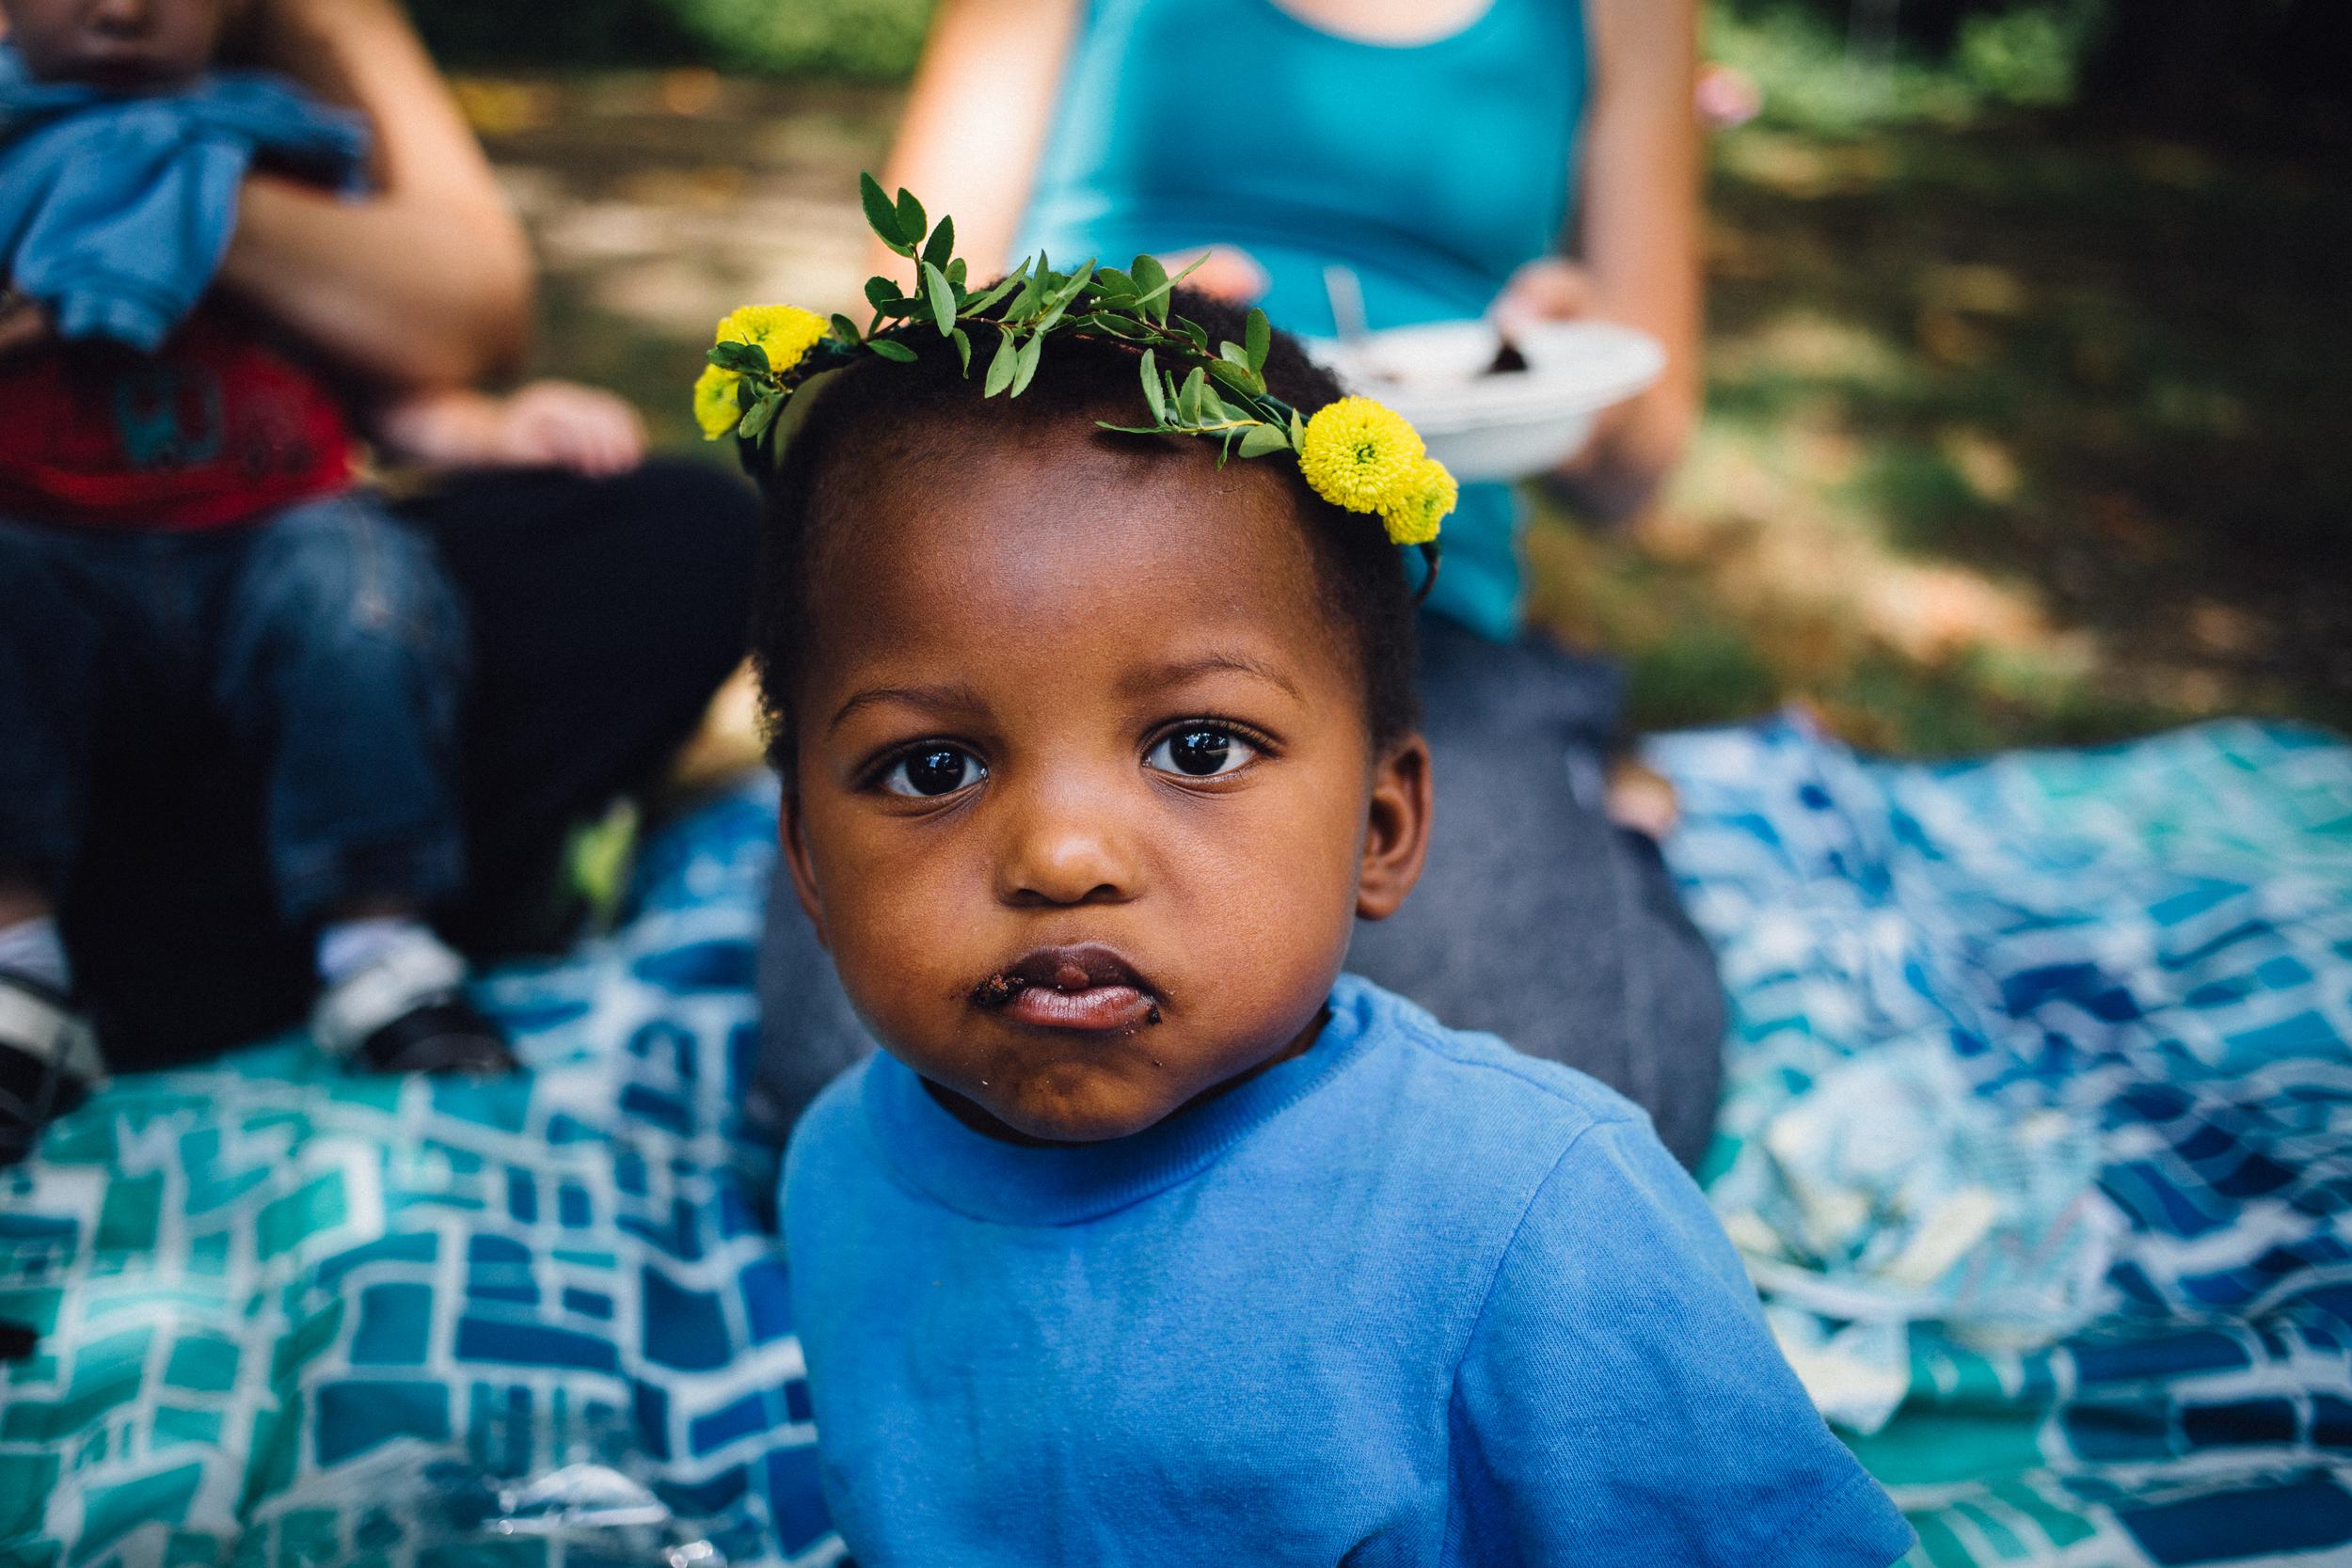 dogwoodphotography_photographer_vancouver_child_roosbday-15.jpg